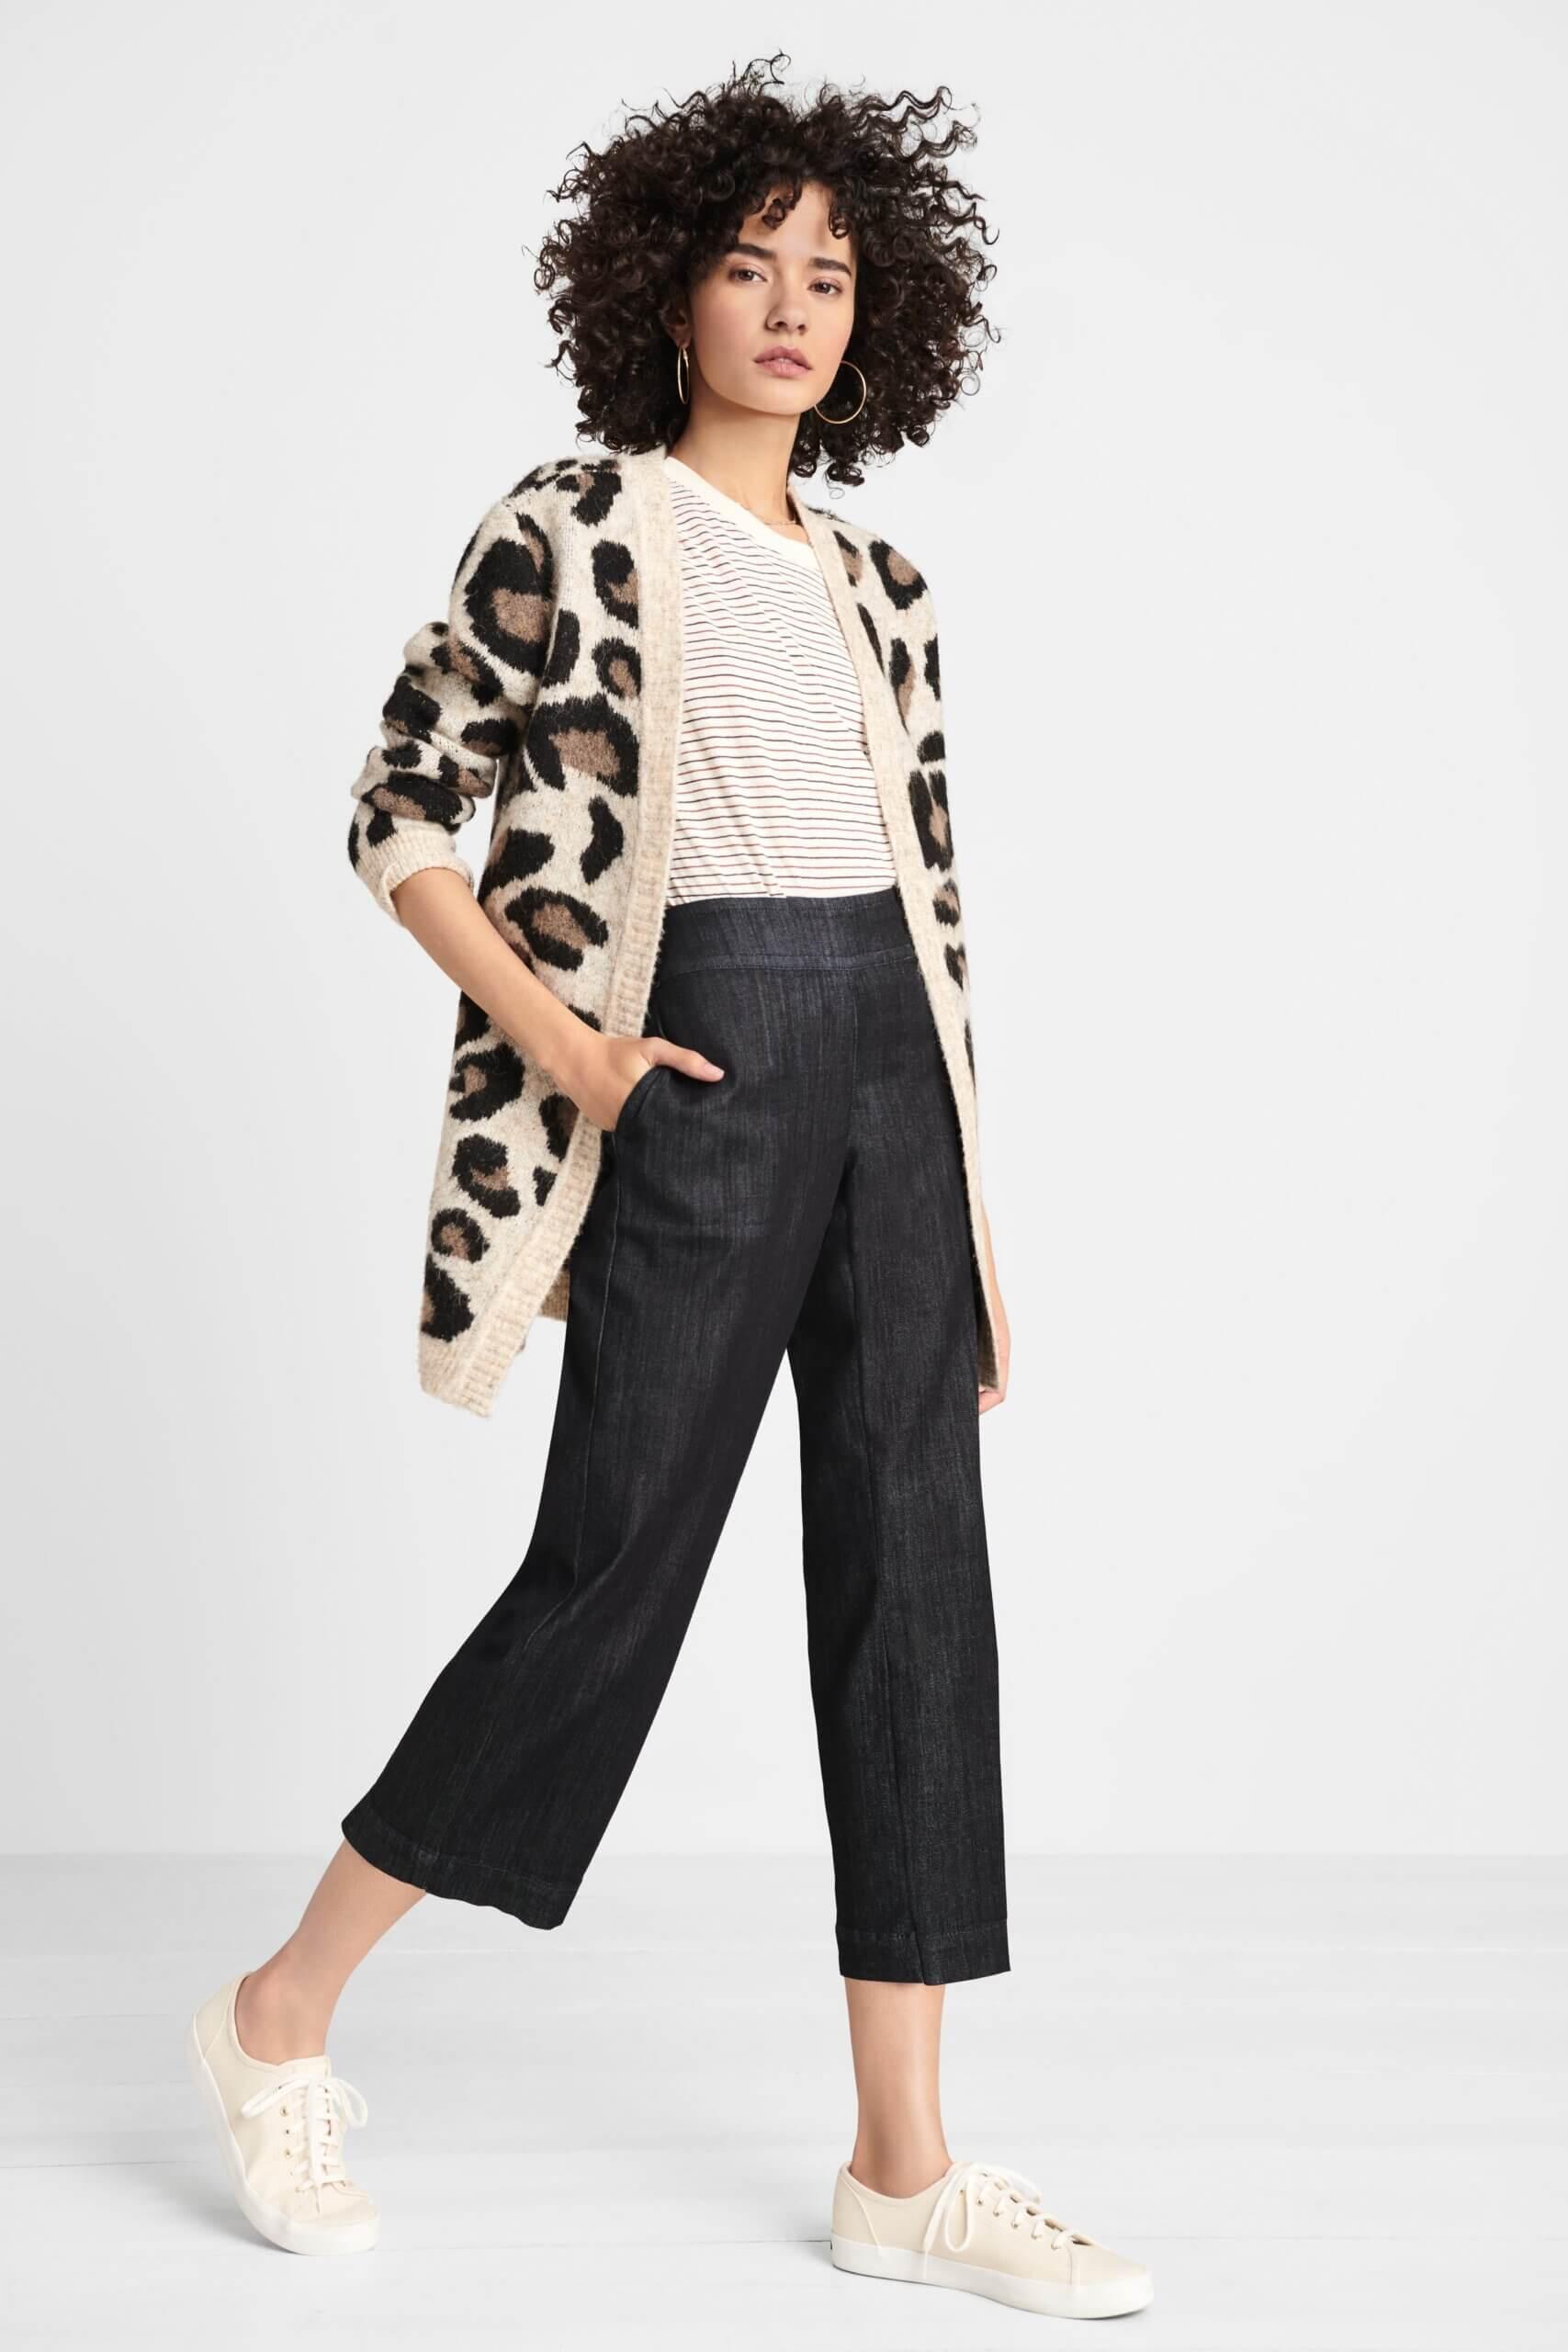 Stitch Fix women's model wearing black wide-leg cropped denim, cream striped tee, leopard print cardigan and white sneakers.